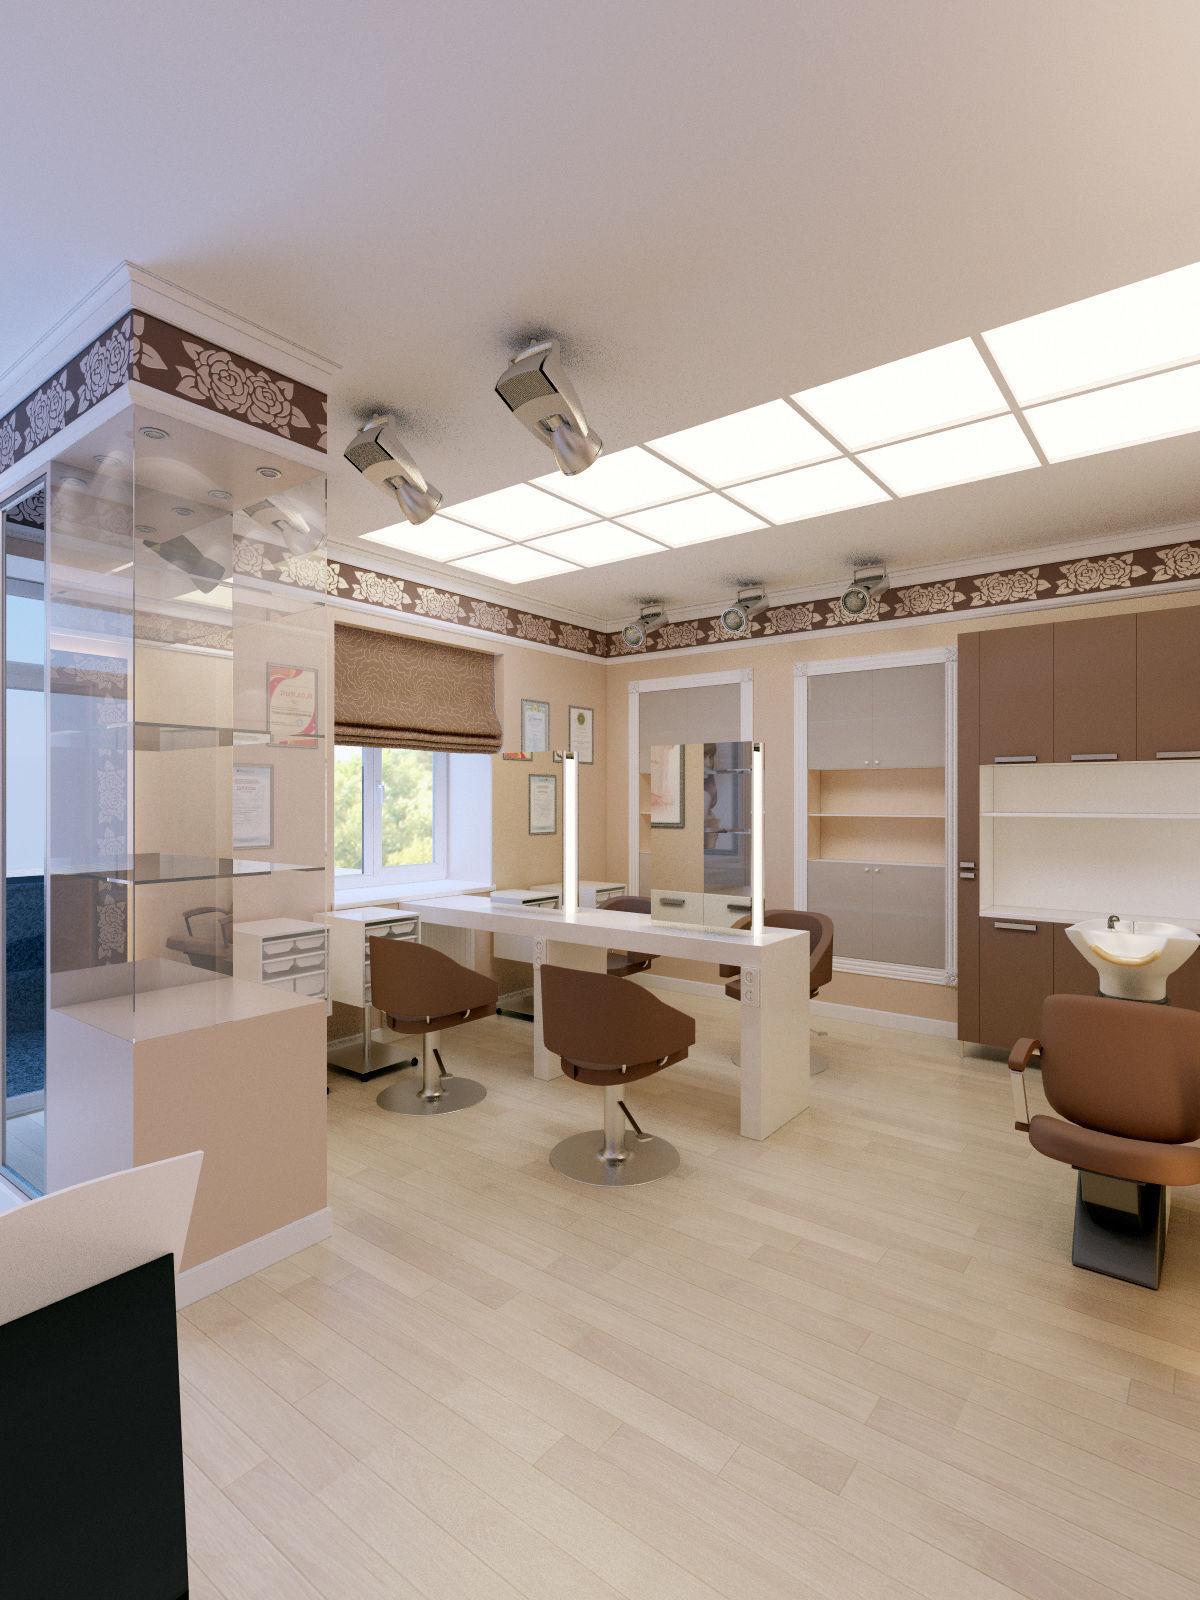 Hair and Beauty salon interior 3D model   CGTrader